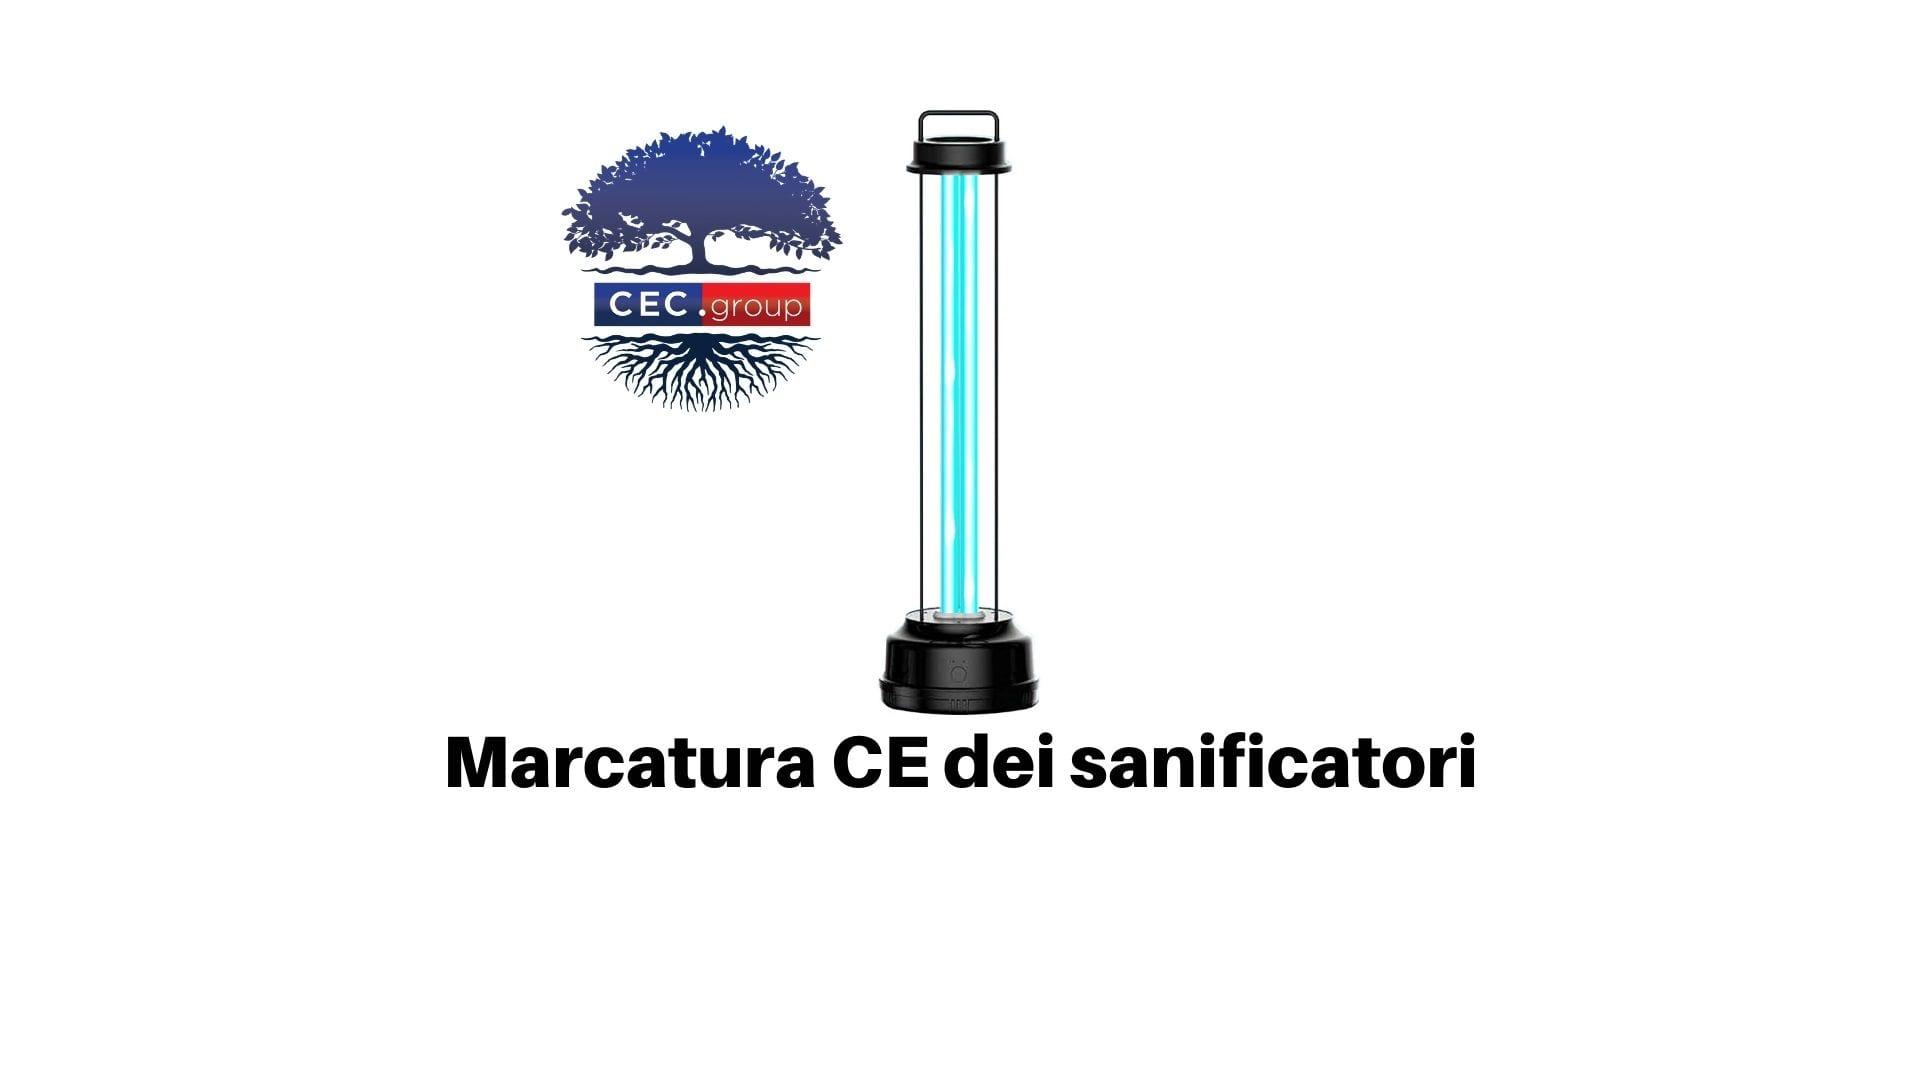 Marcatura CE sanificatori